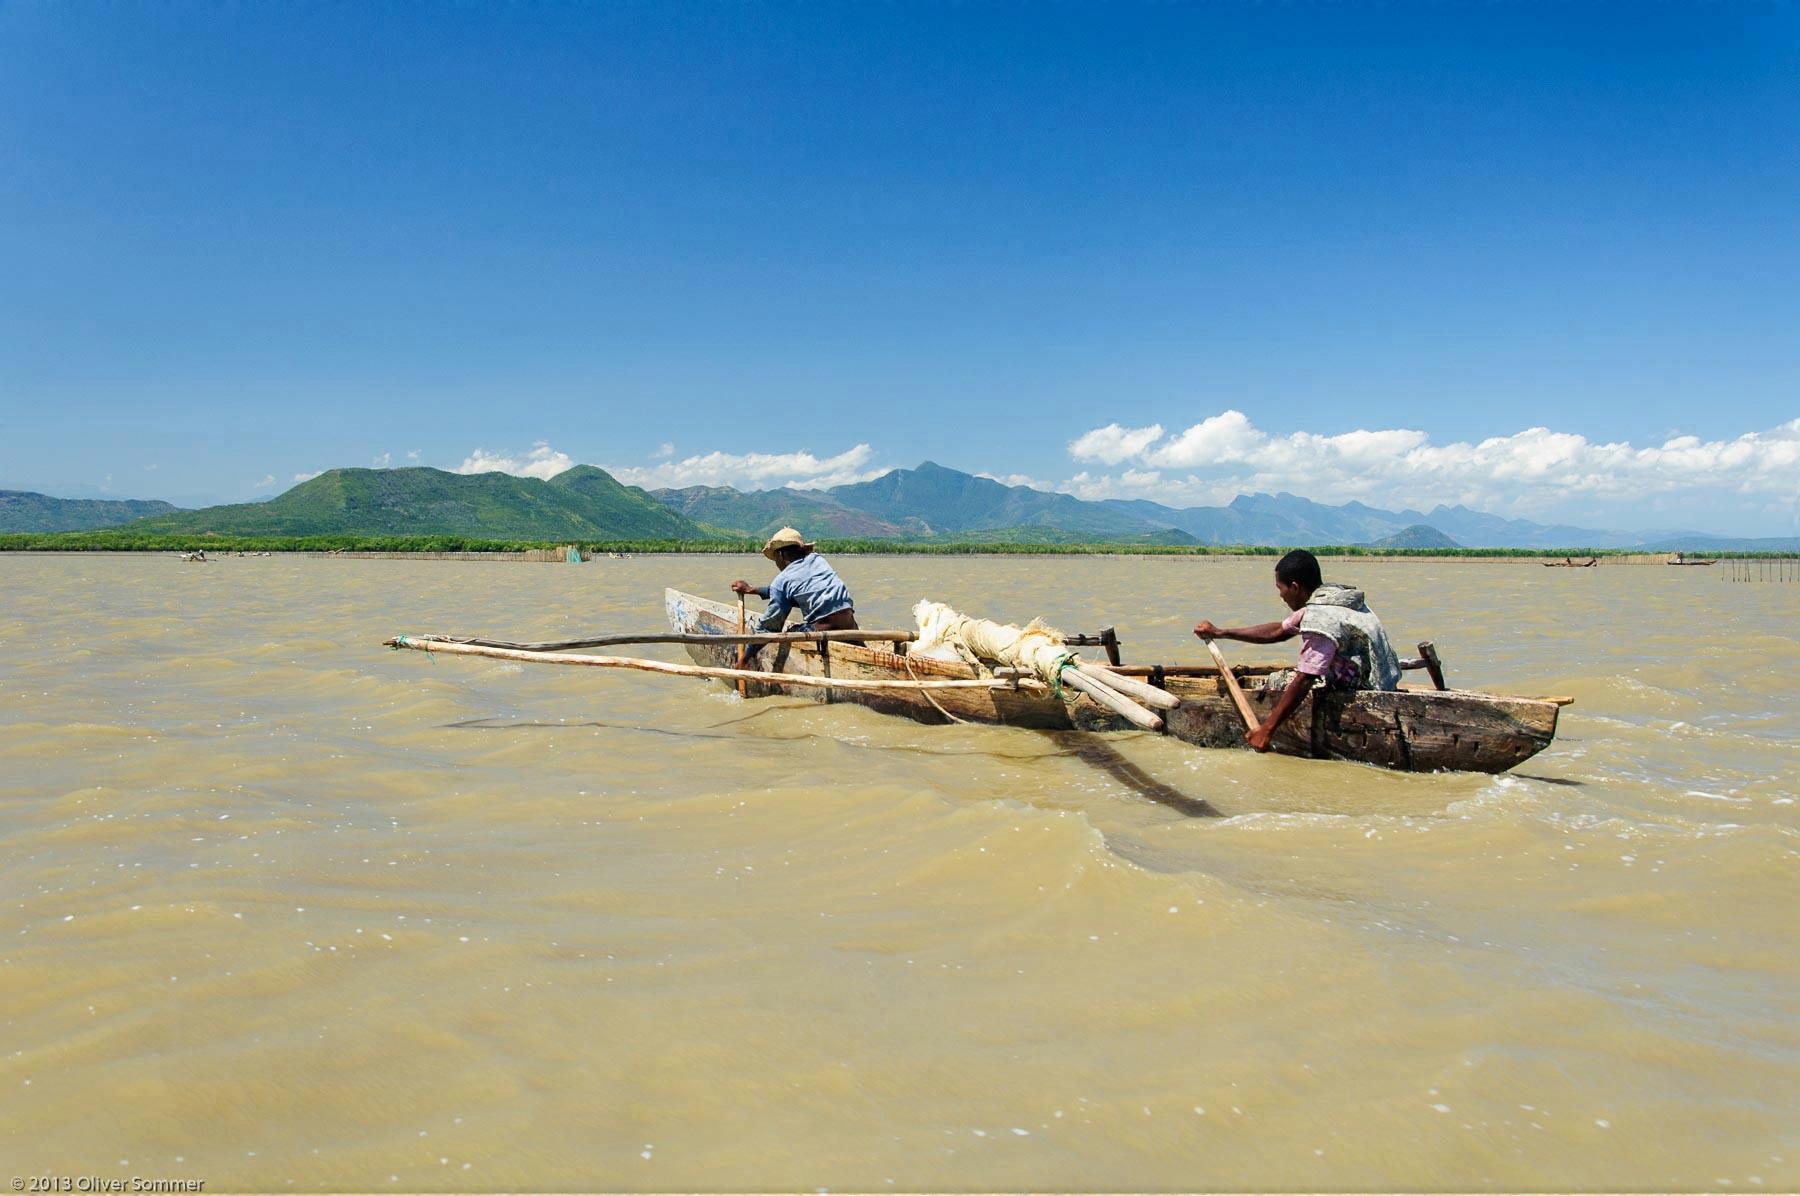 Traditional Dug-out canoe Fishermen Madagascar Mangroves